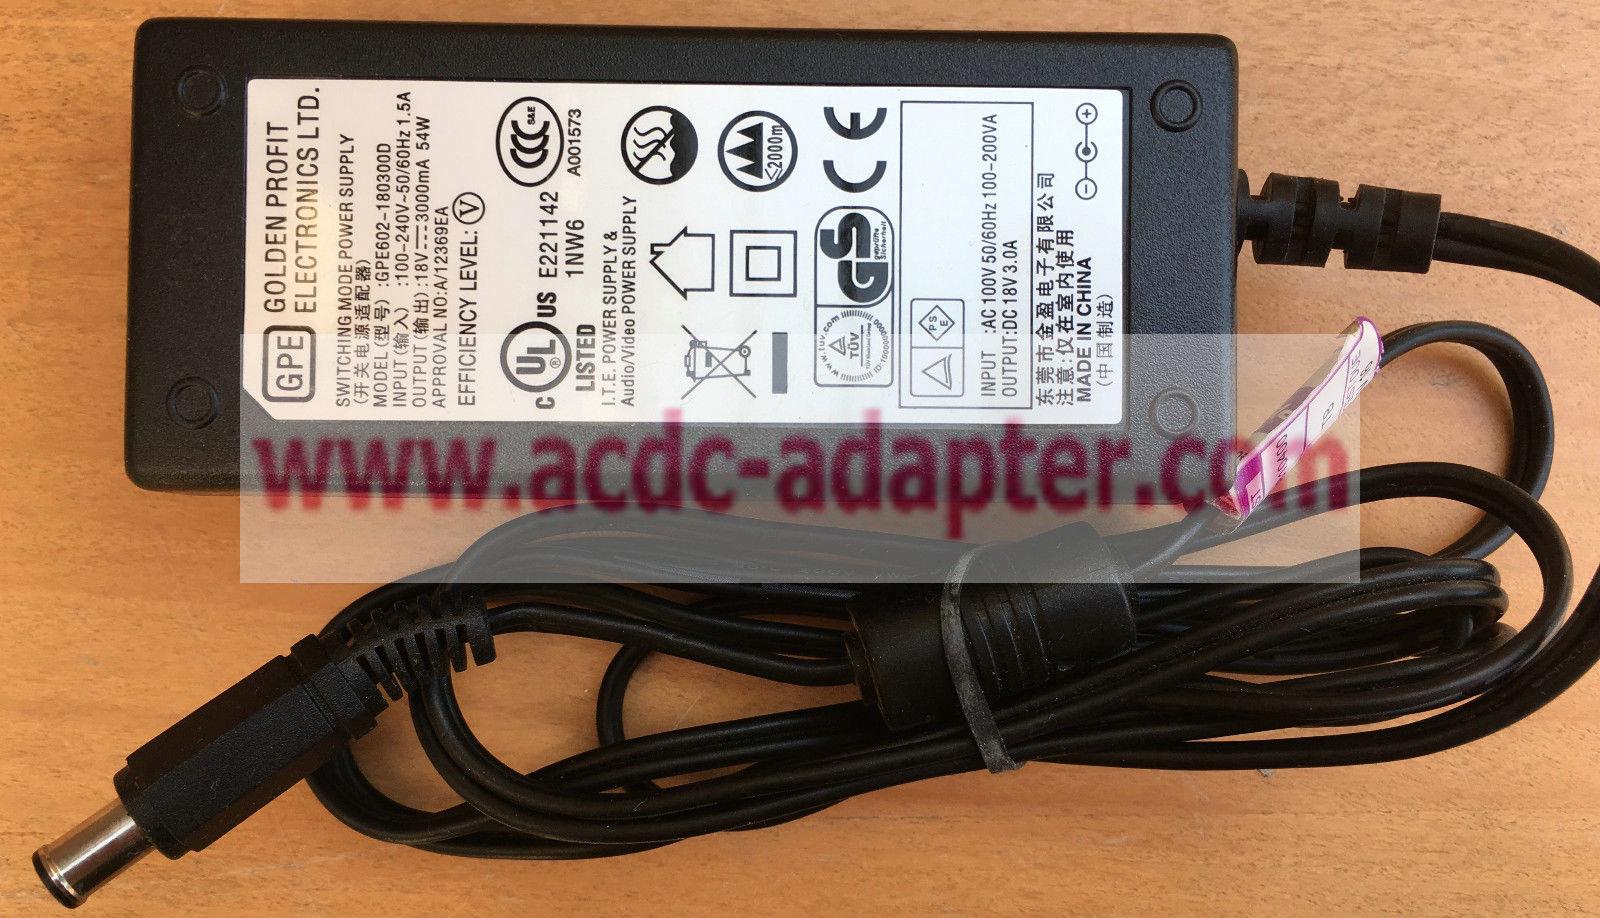 Genuine Kodak HPA-432418A0 ITE Power Supply AC Adapter Output DC 24V 1.8A